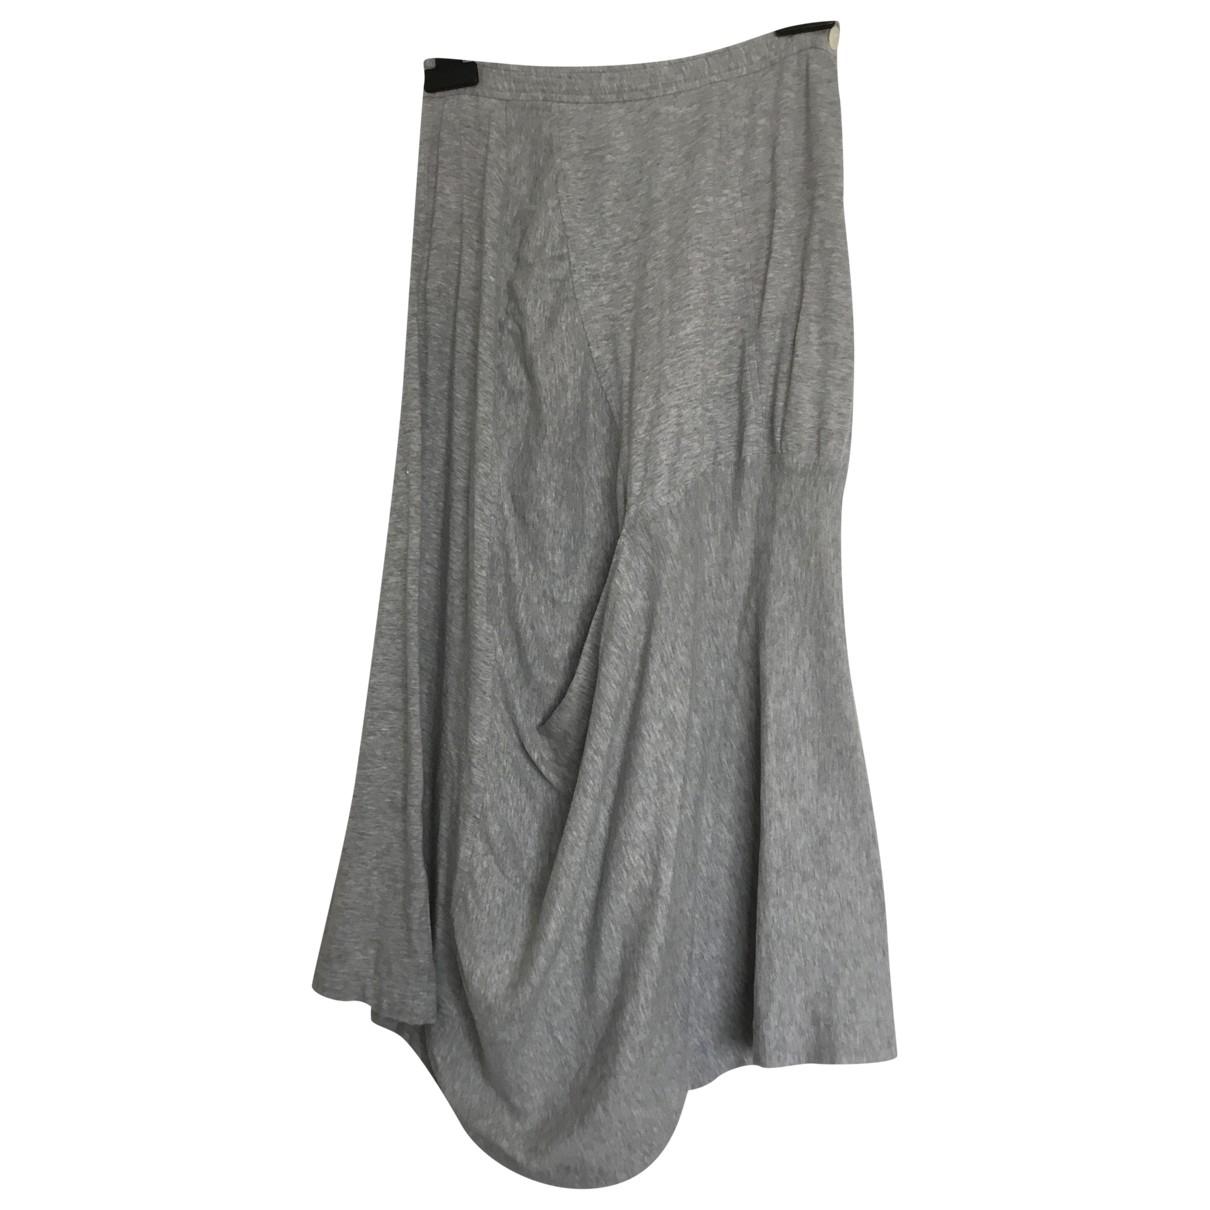 Comme Des Garcons \N Grey Cotton skirt for Women M International